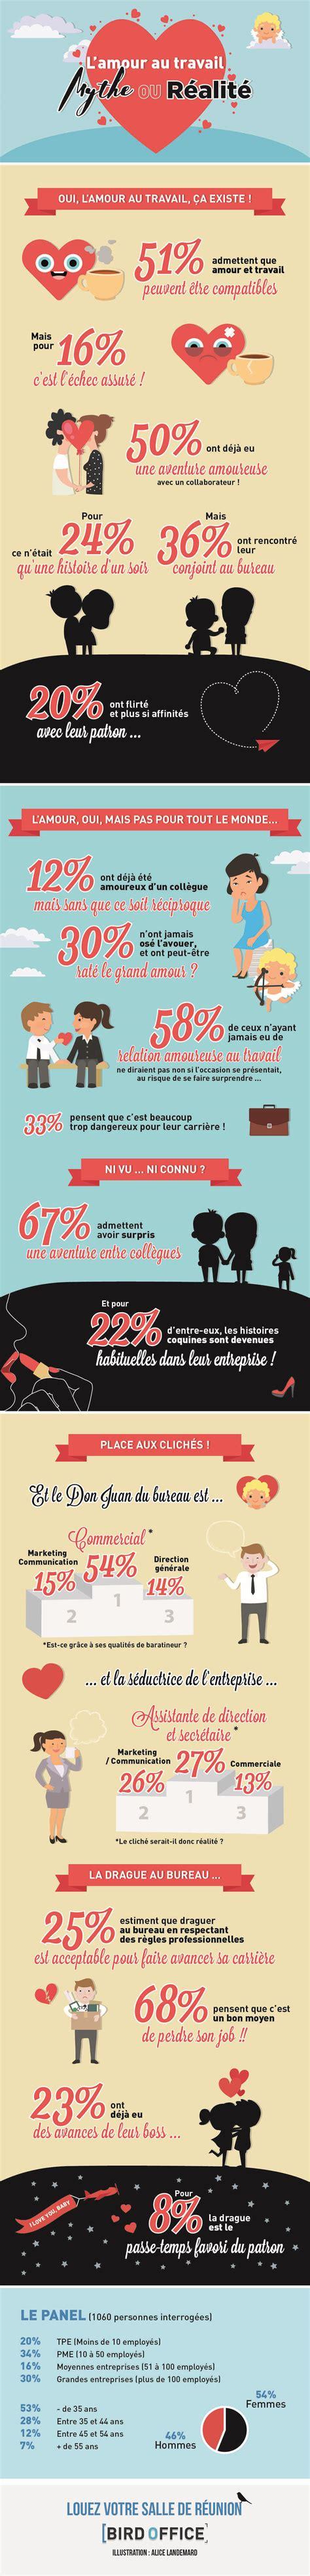 amour au bureau l 39 amour au bureau l 39 infographie bird office